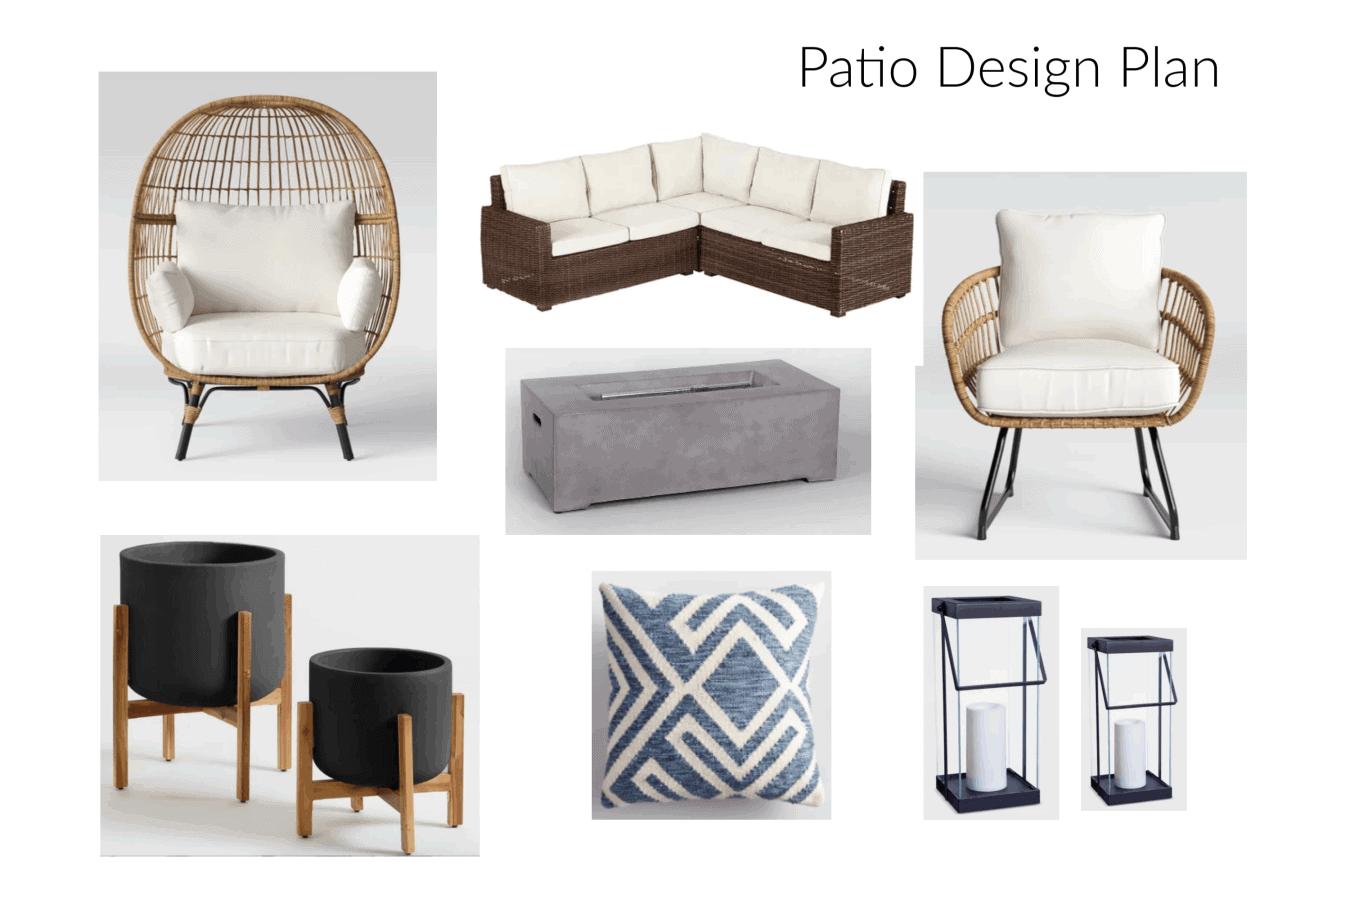 Modern boho patio design plan